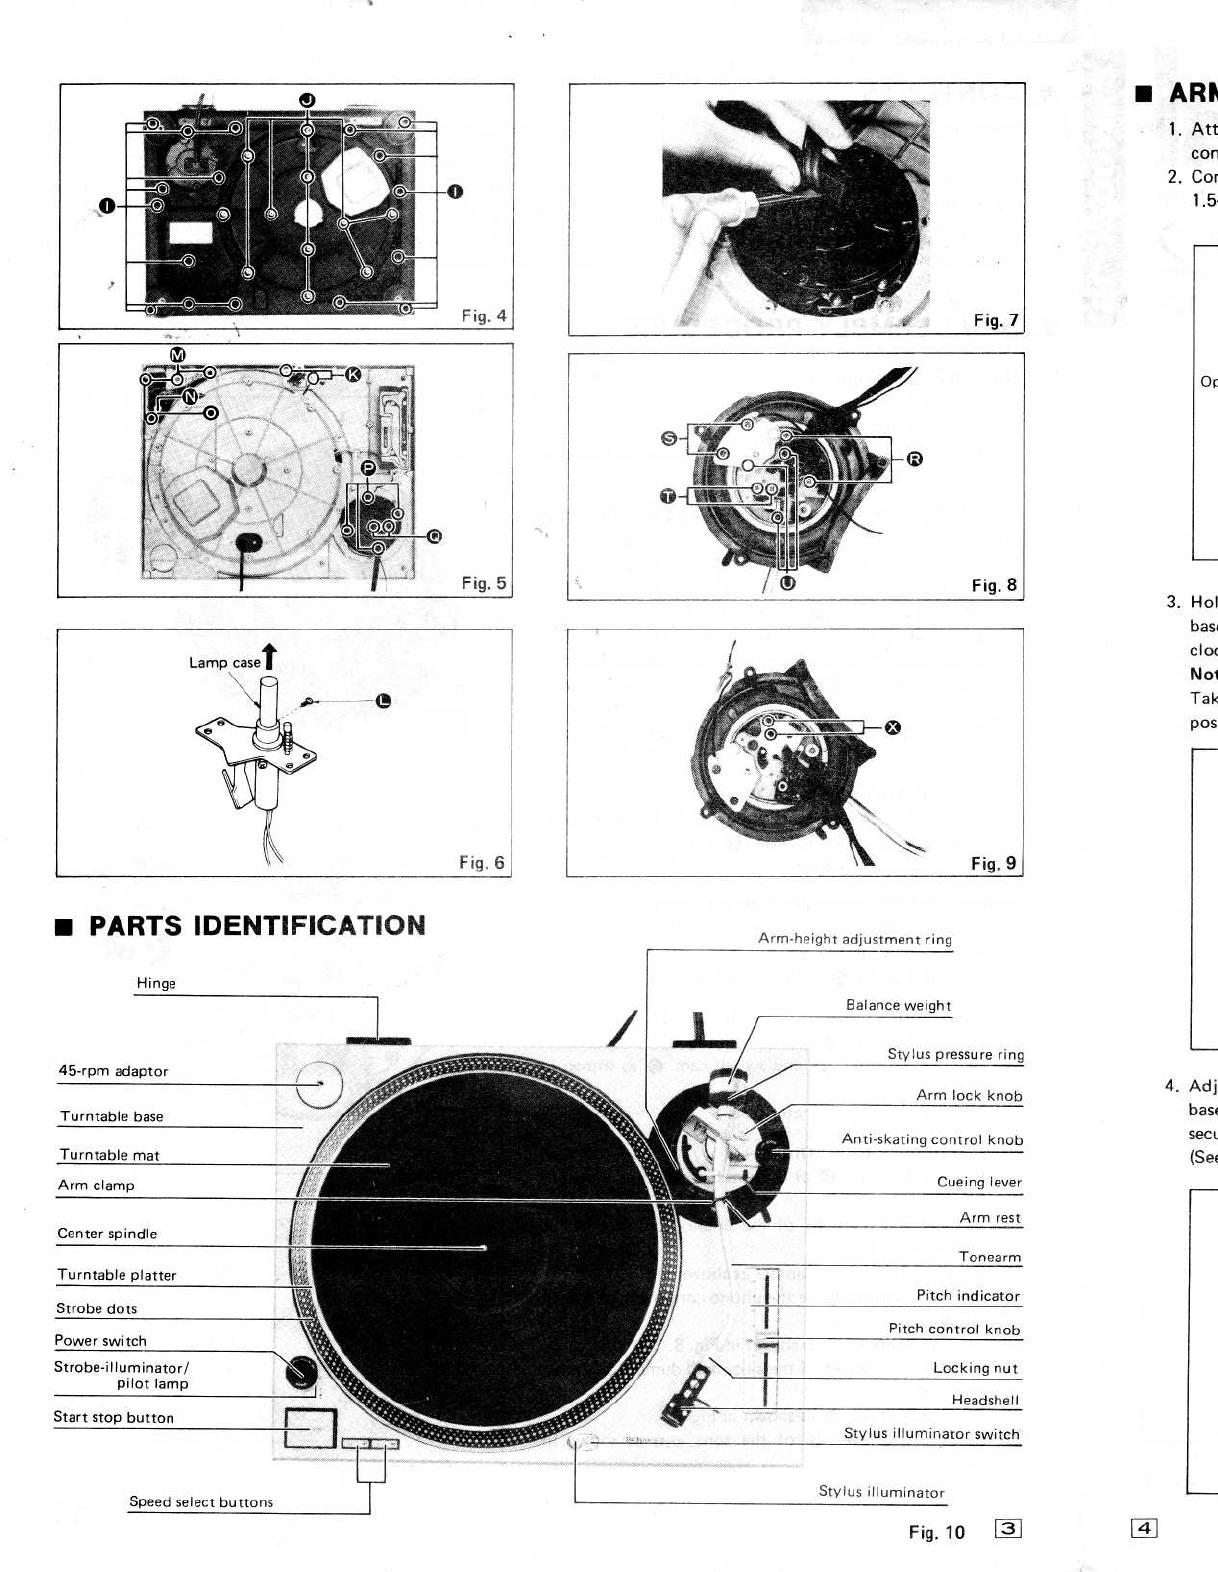 Handleiding Technics sl-1200mk2 (pagina 1 van 20) (English)